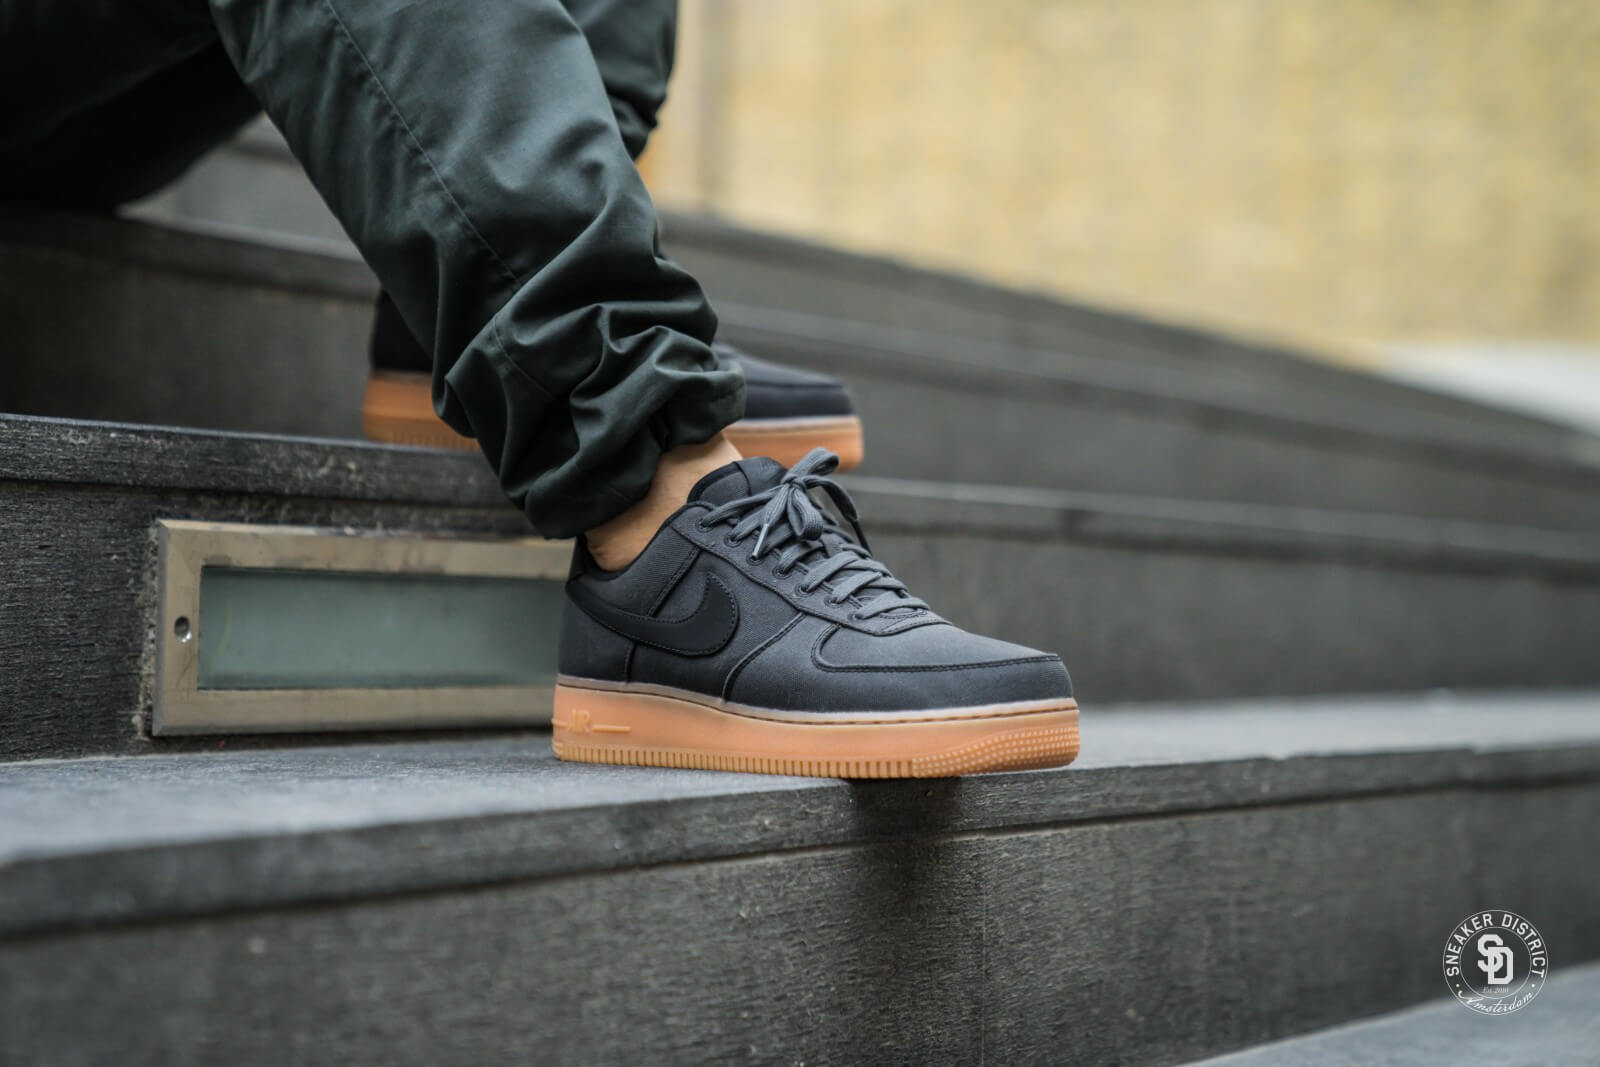 Nike Air Force 1 07 Lv8 shoes black brown